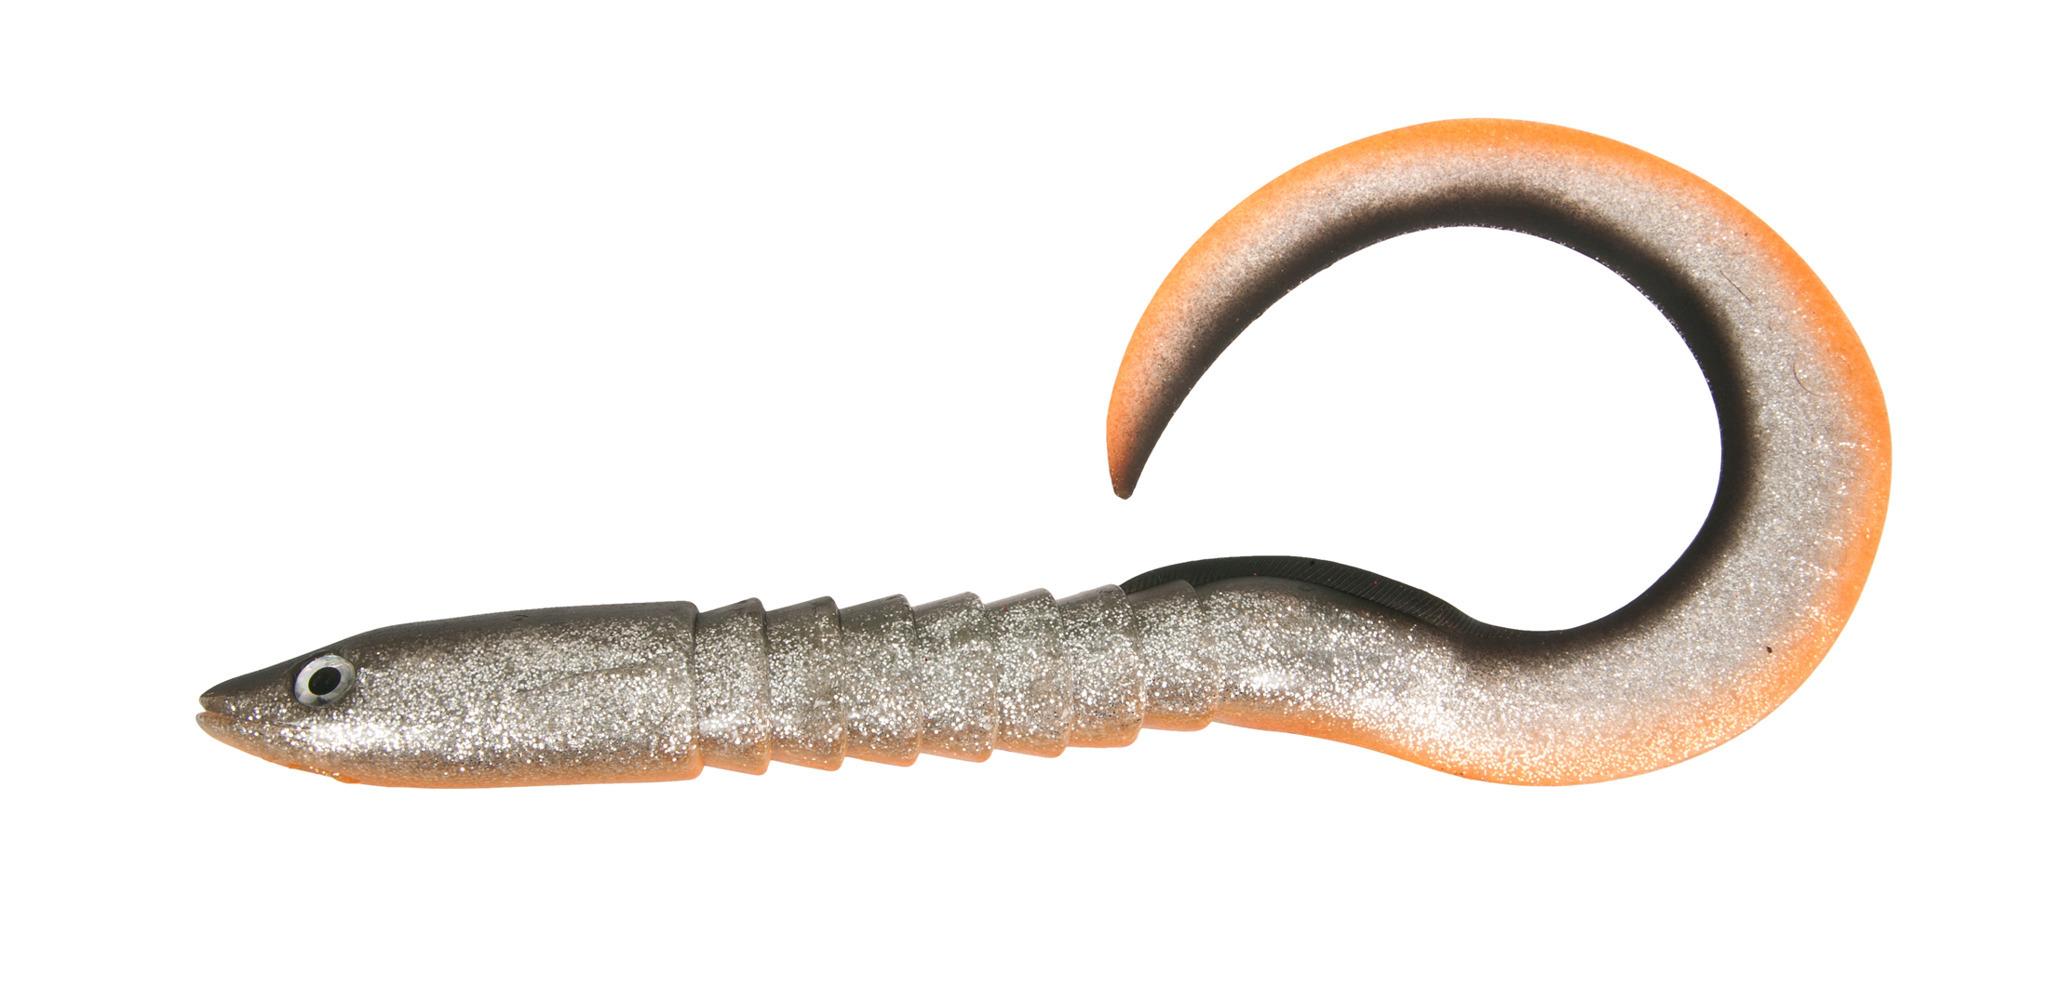 Sanger veľký twister pre sumu / halibuta bo-38,0 cm